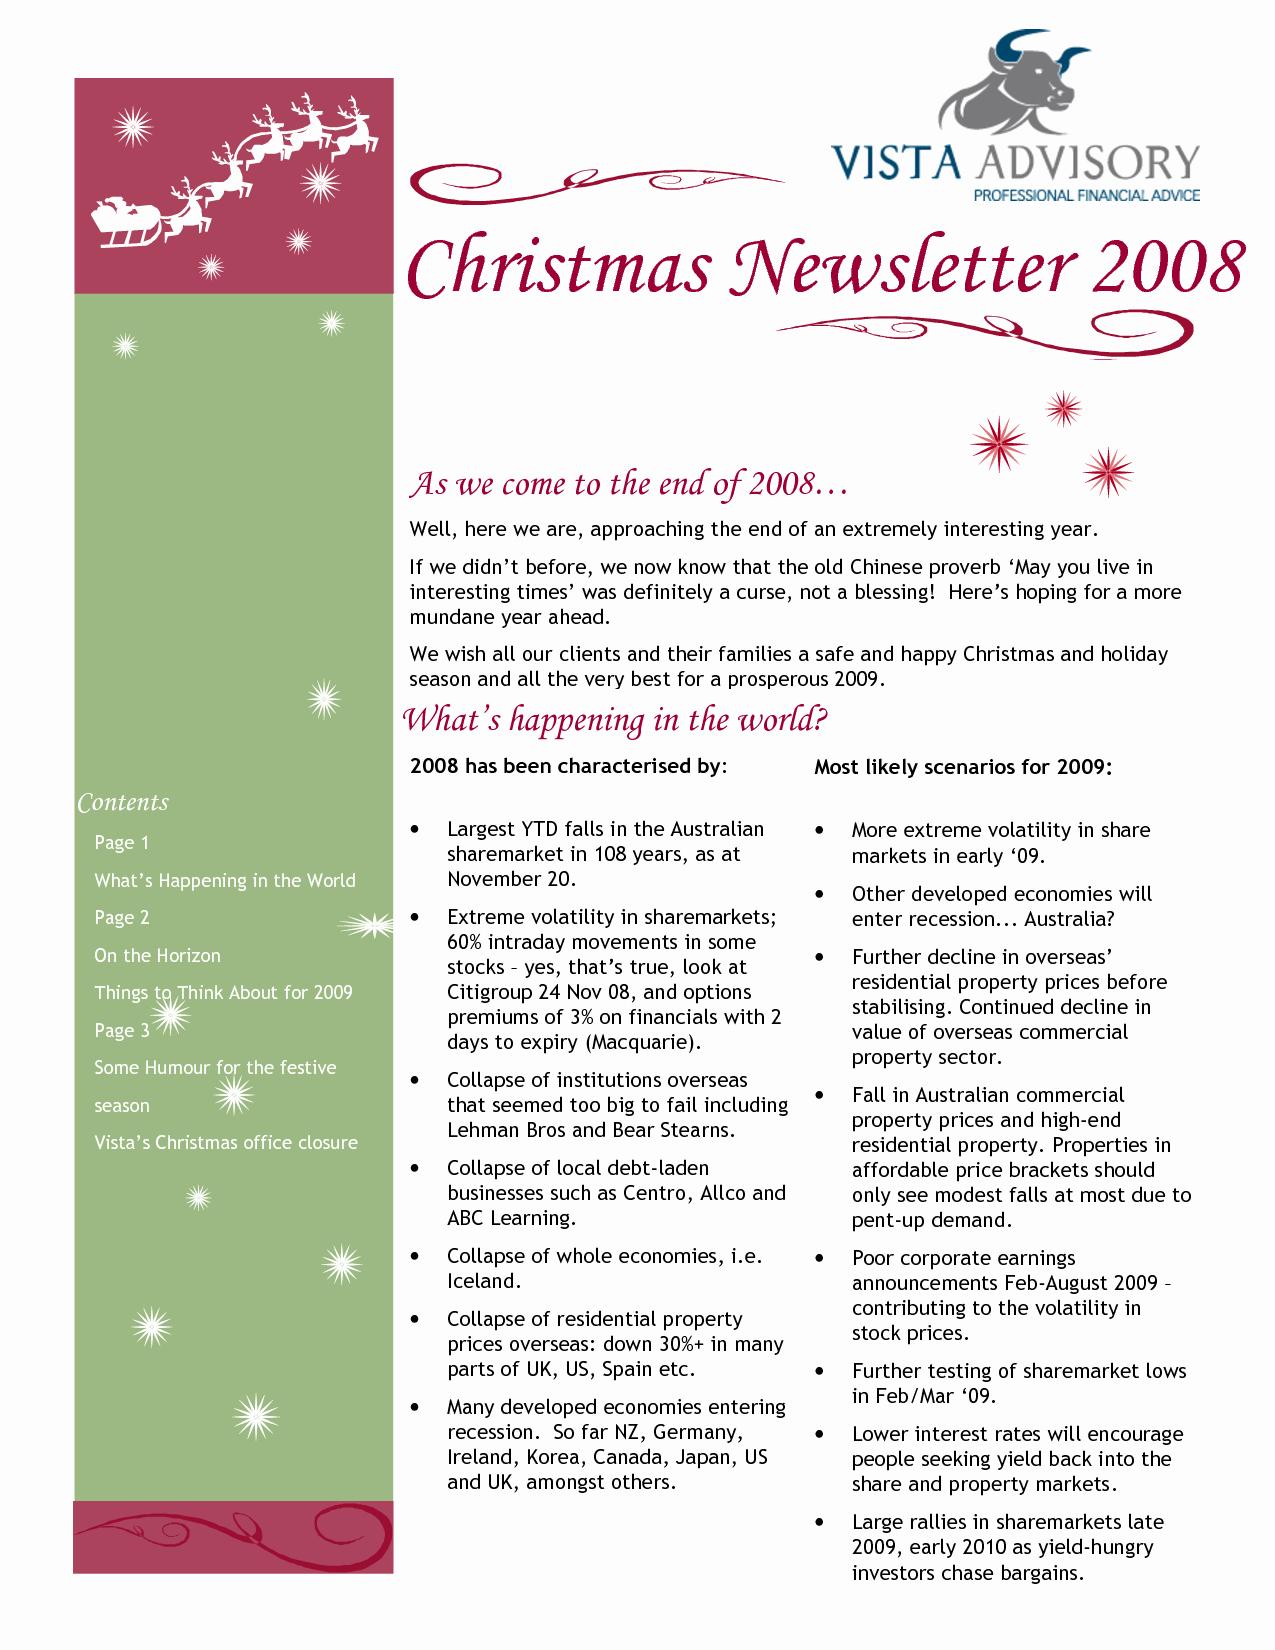 Christmas Family Newsletter Template Free Lovely Best S Of Family Annual Christmas Letter Examples